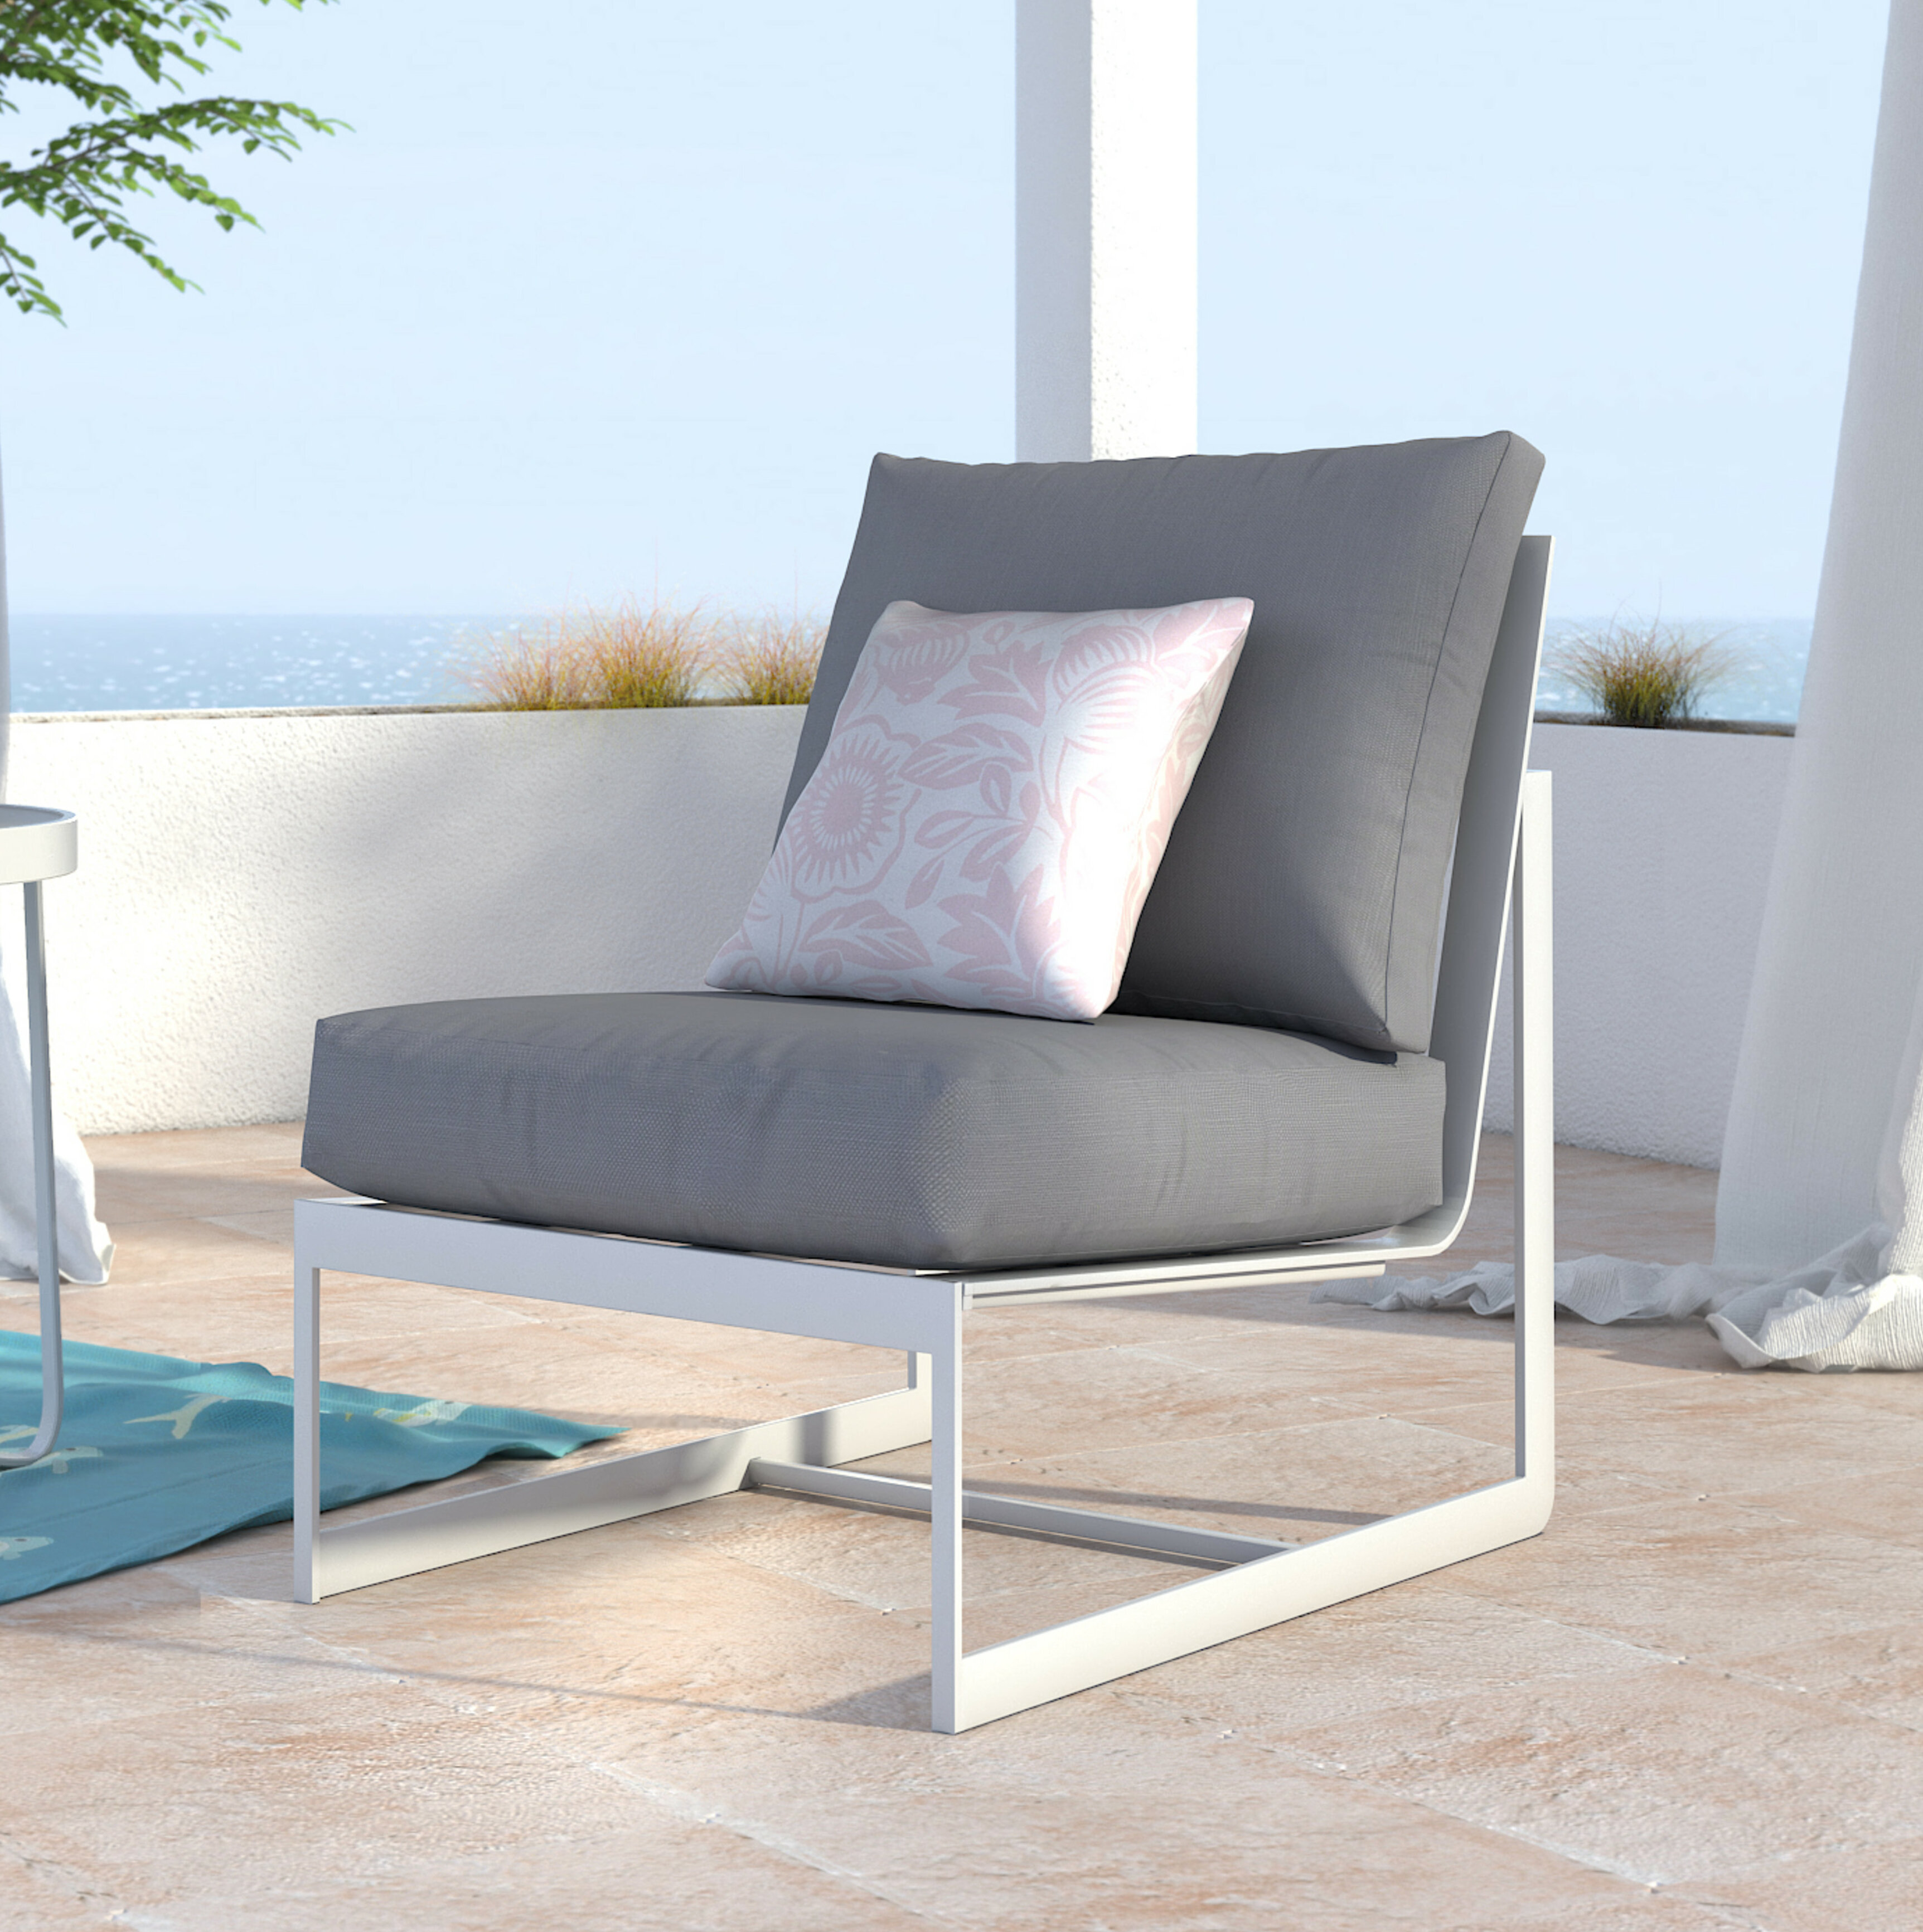 Mirabelle Armless Patio Chair